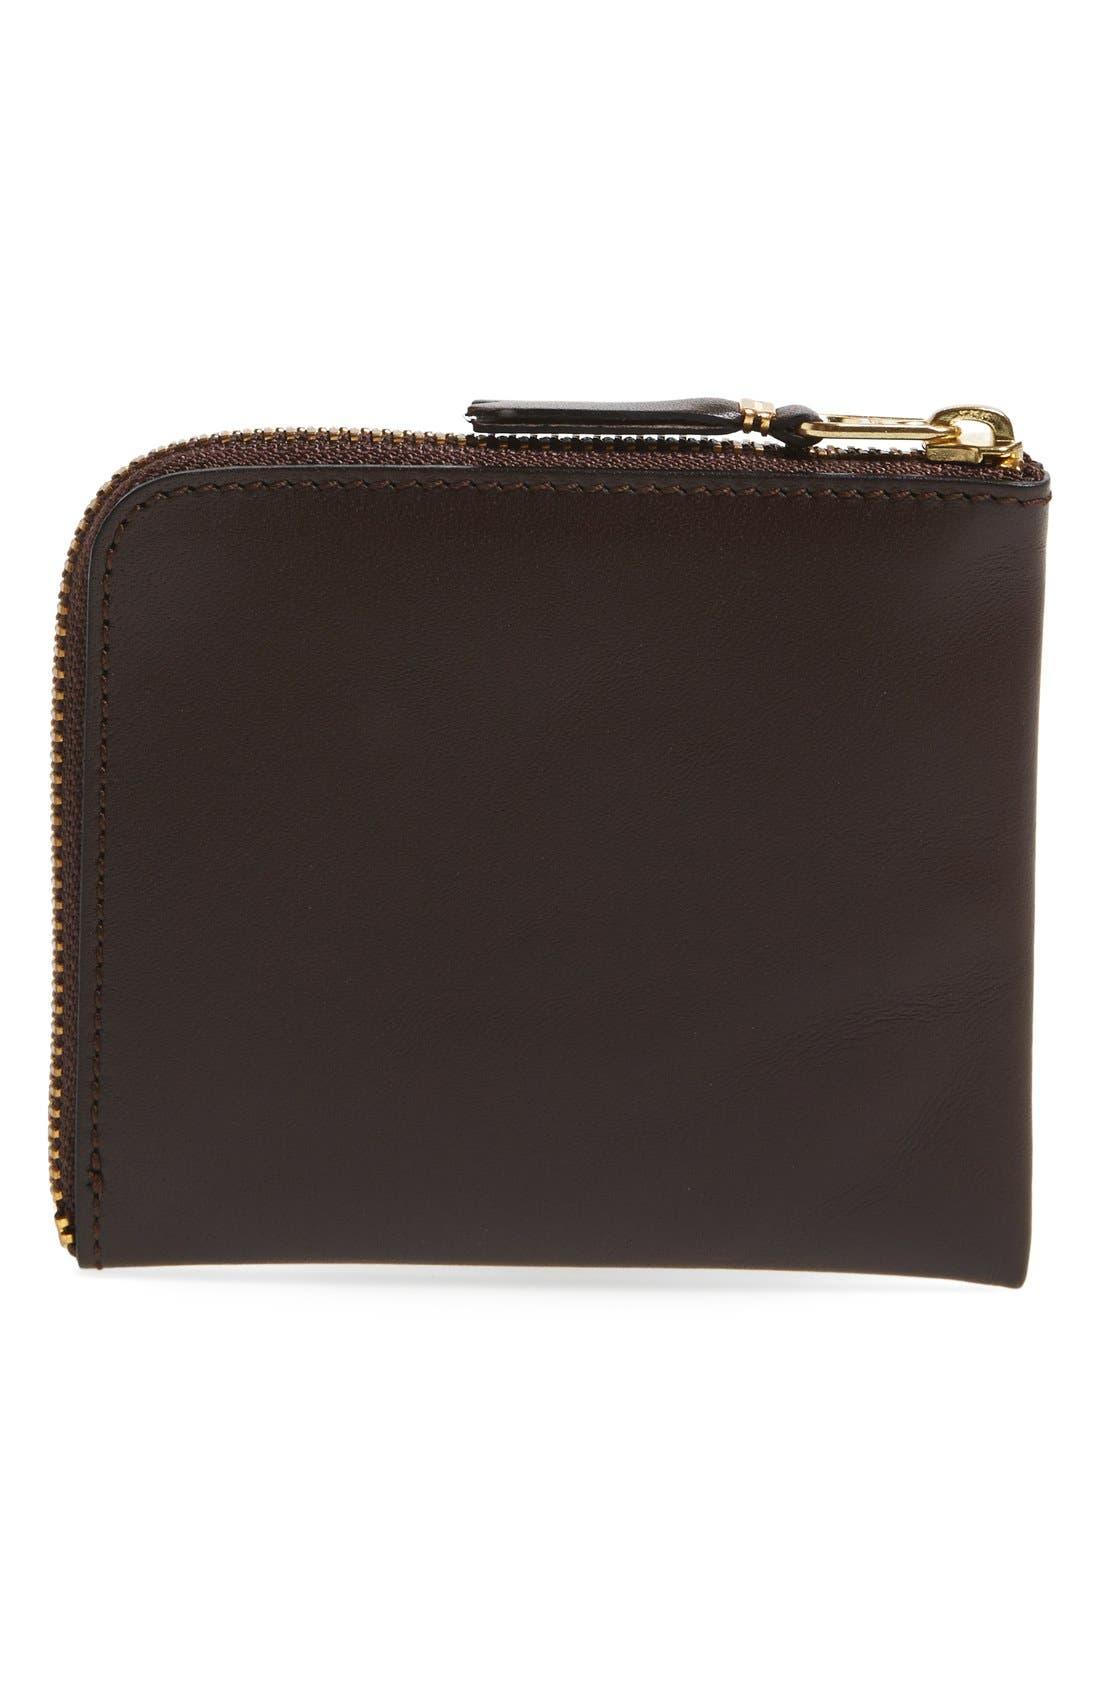 Alternate Image 3  - Comme des Garçons Half-Zip Leather Wallet